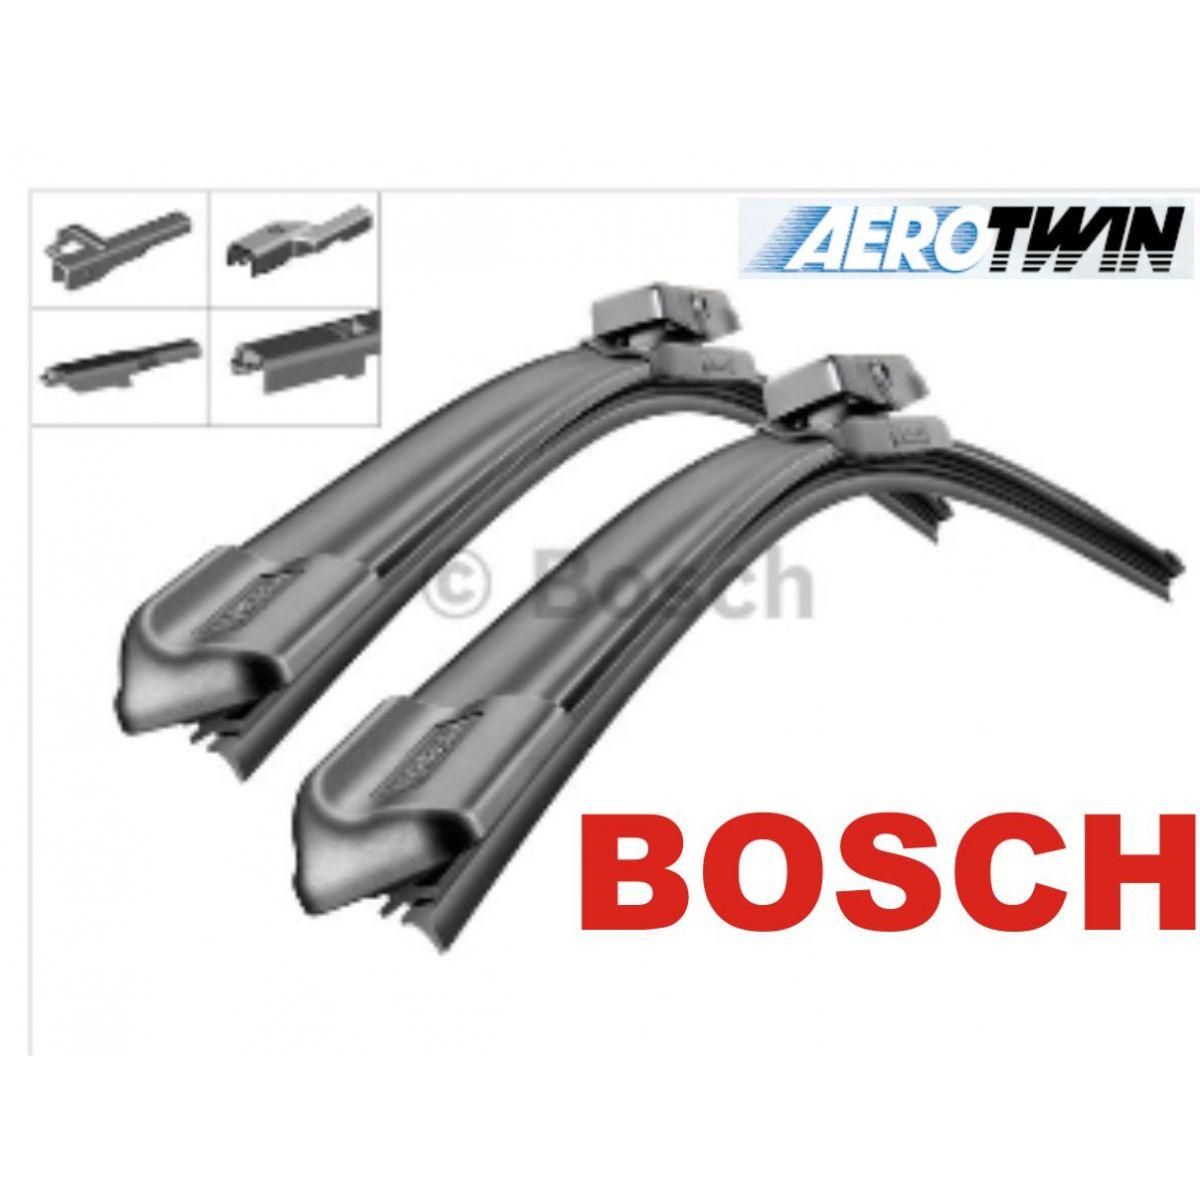 Palheta Bosch Aerotwin Plus Limpador de para brisa Bosch Citroen C4 Pallas Hatch VTR 2007 em diante